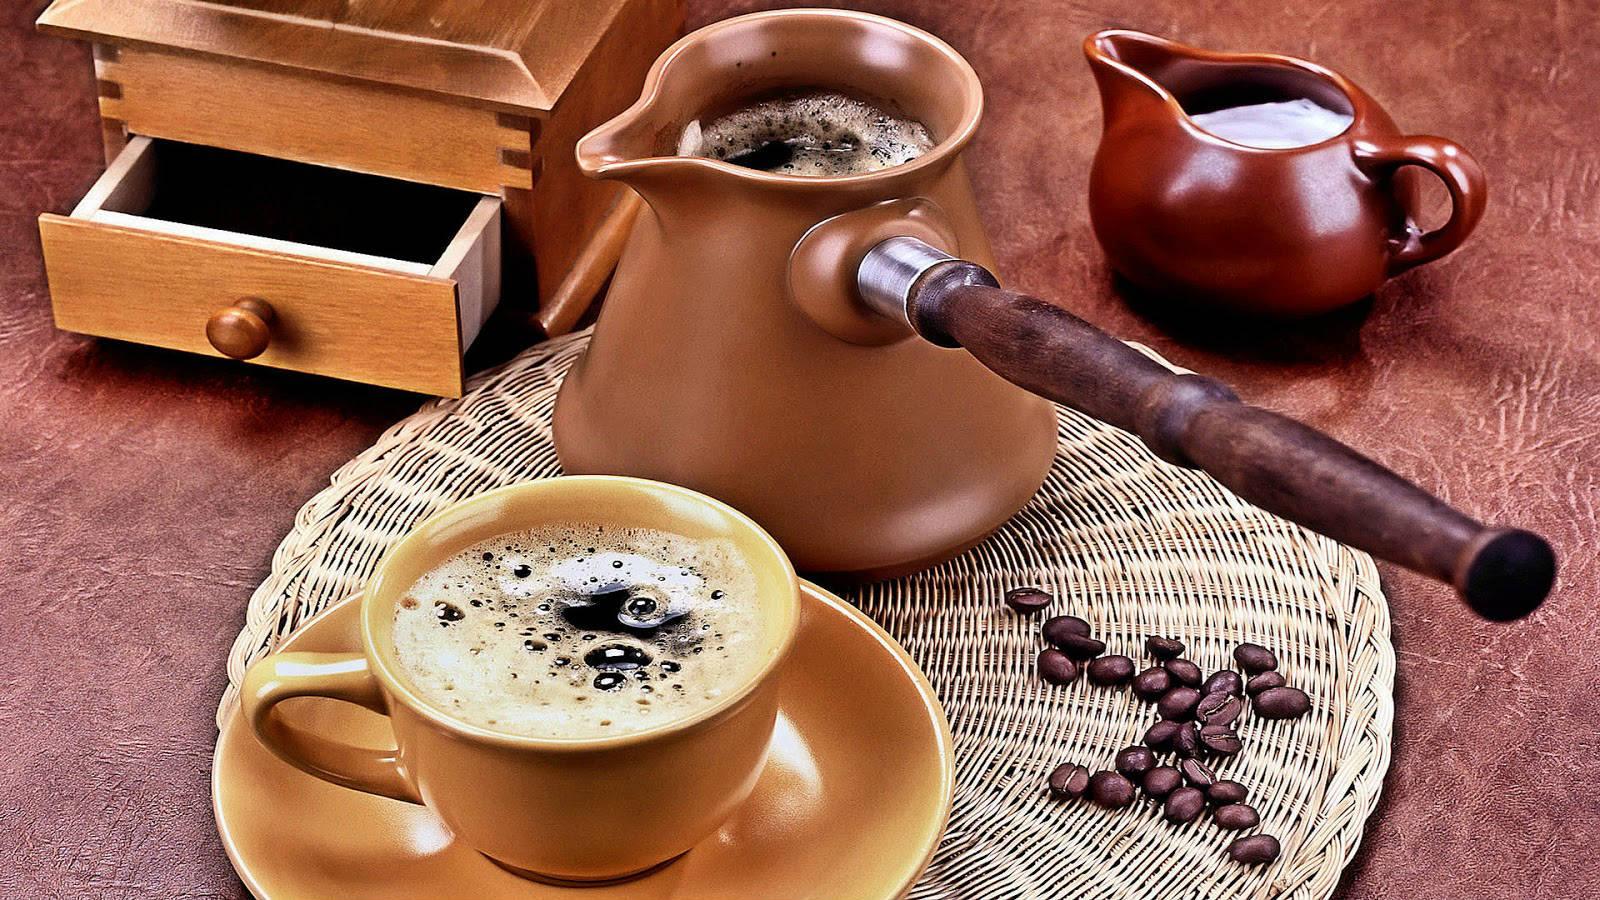 good_coffee_4.jpg (3.2 Kb)